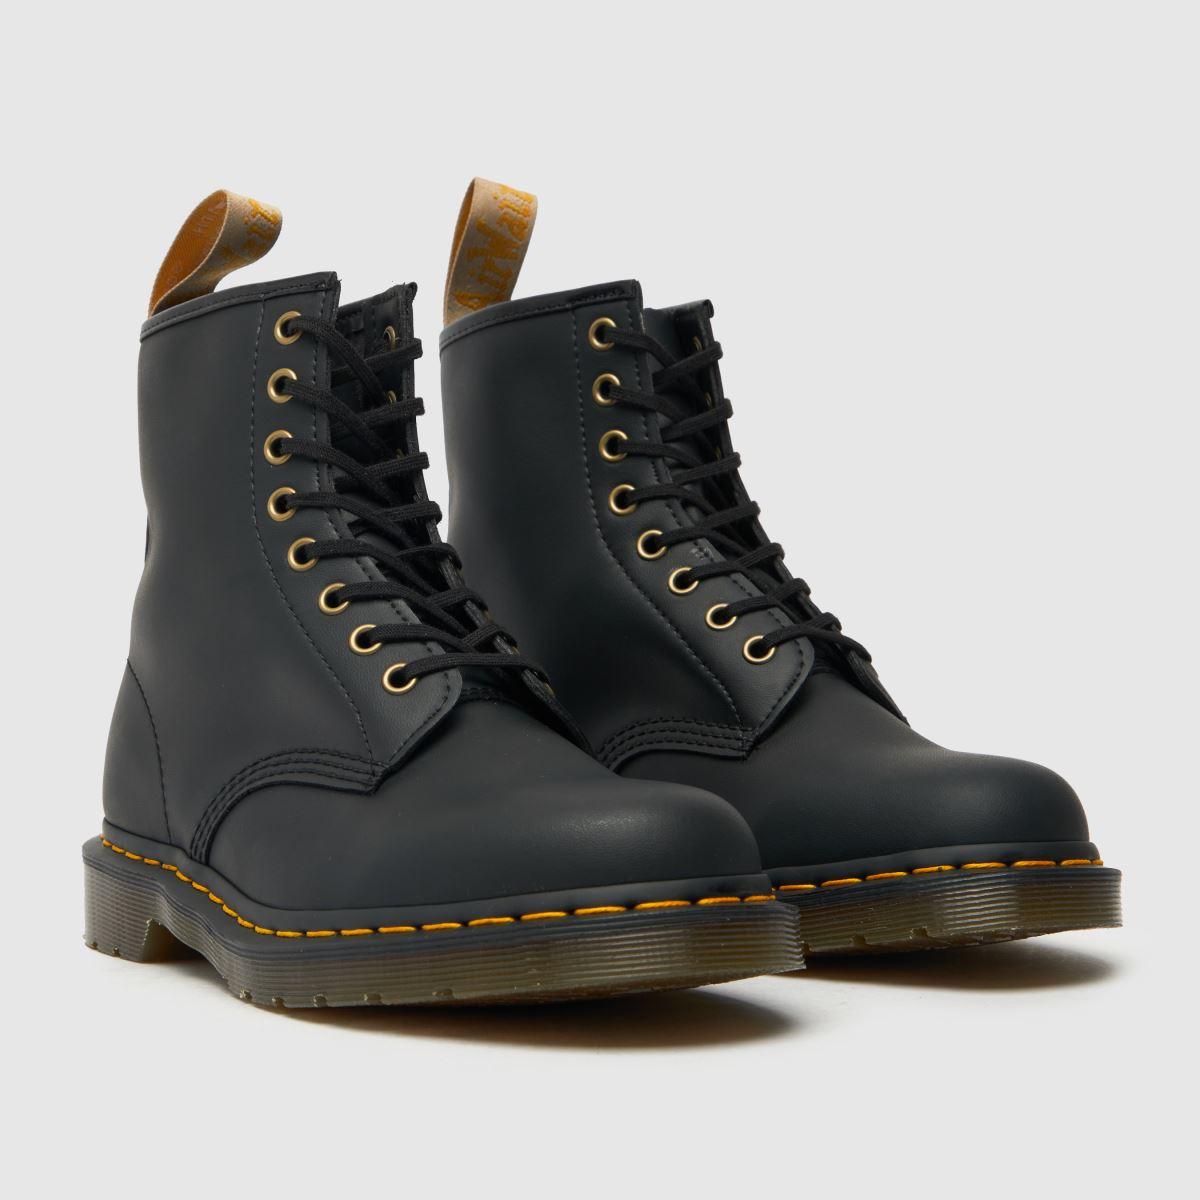 Damen Schwarz dr martens Vegan 1460 8 Eye Boots   schuh Gute Qualität beliebte Schuhe